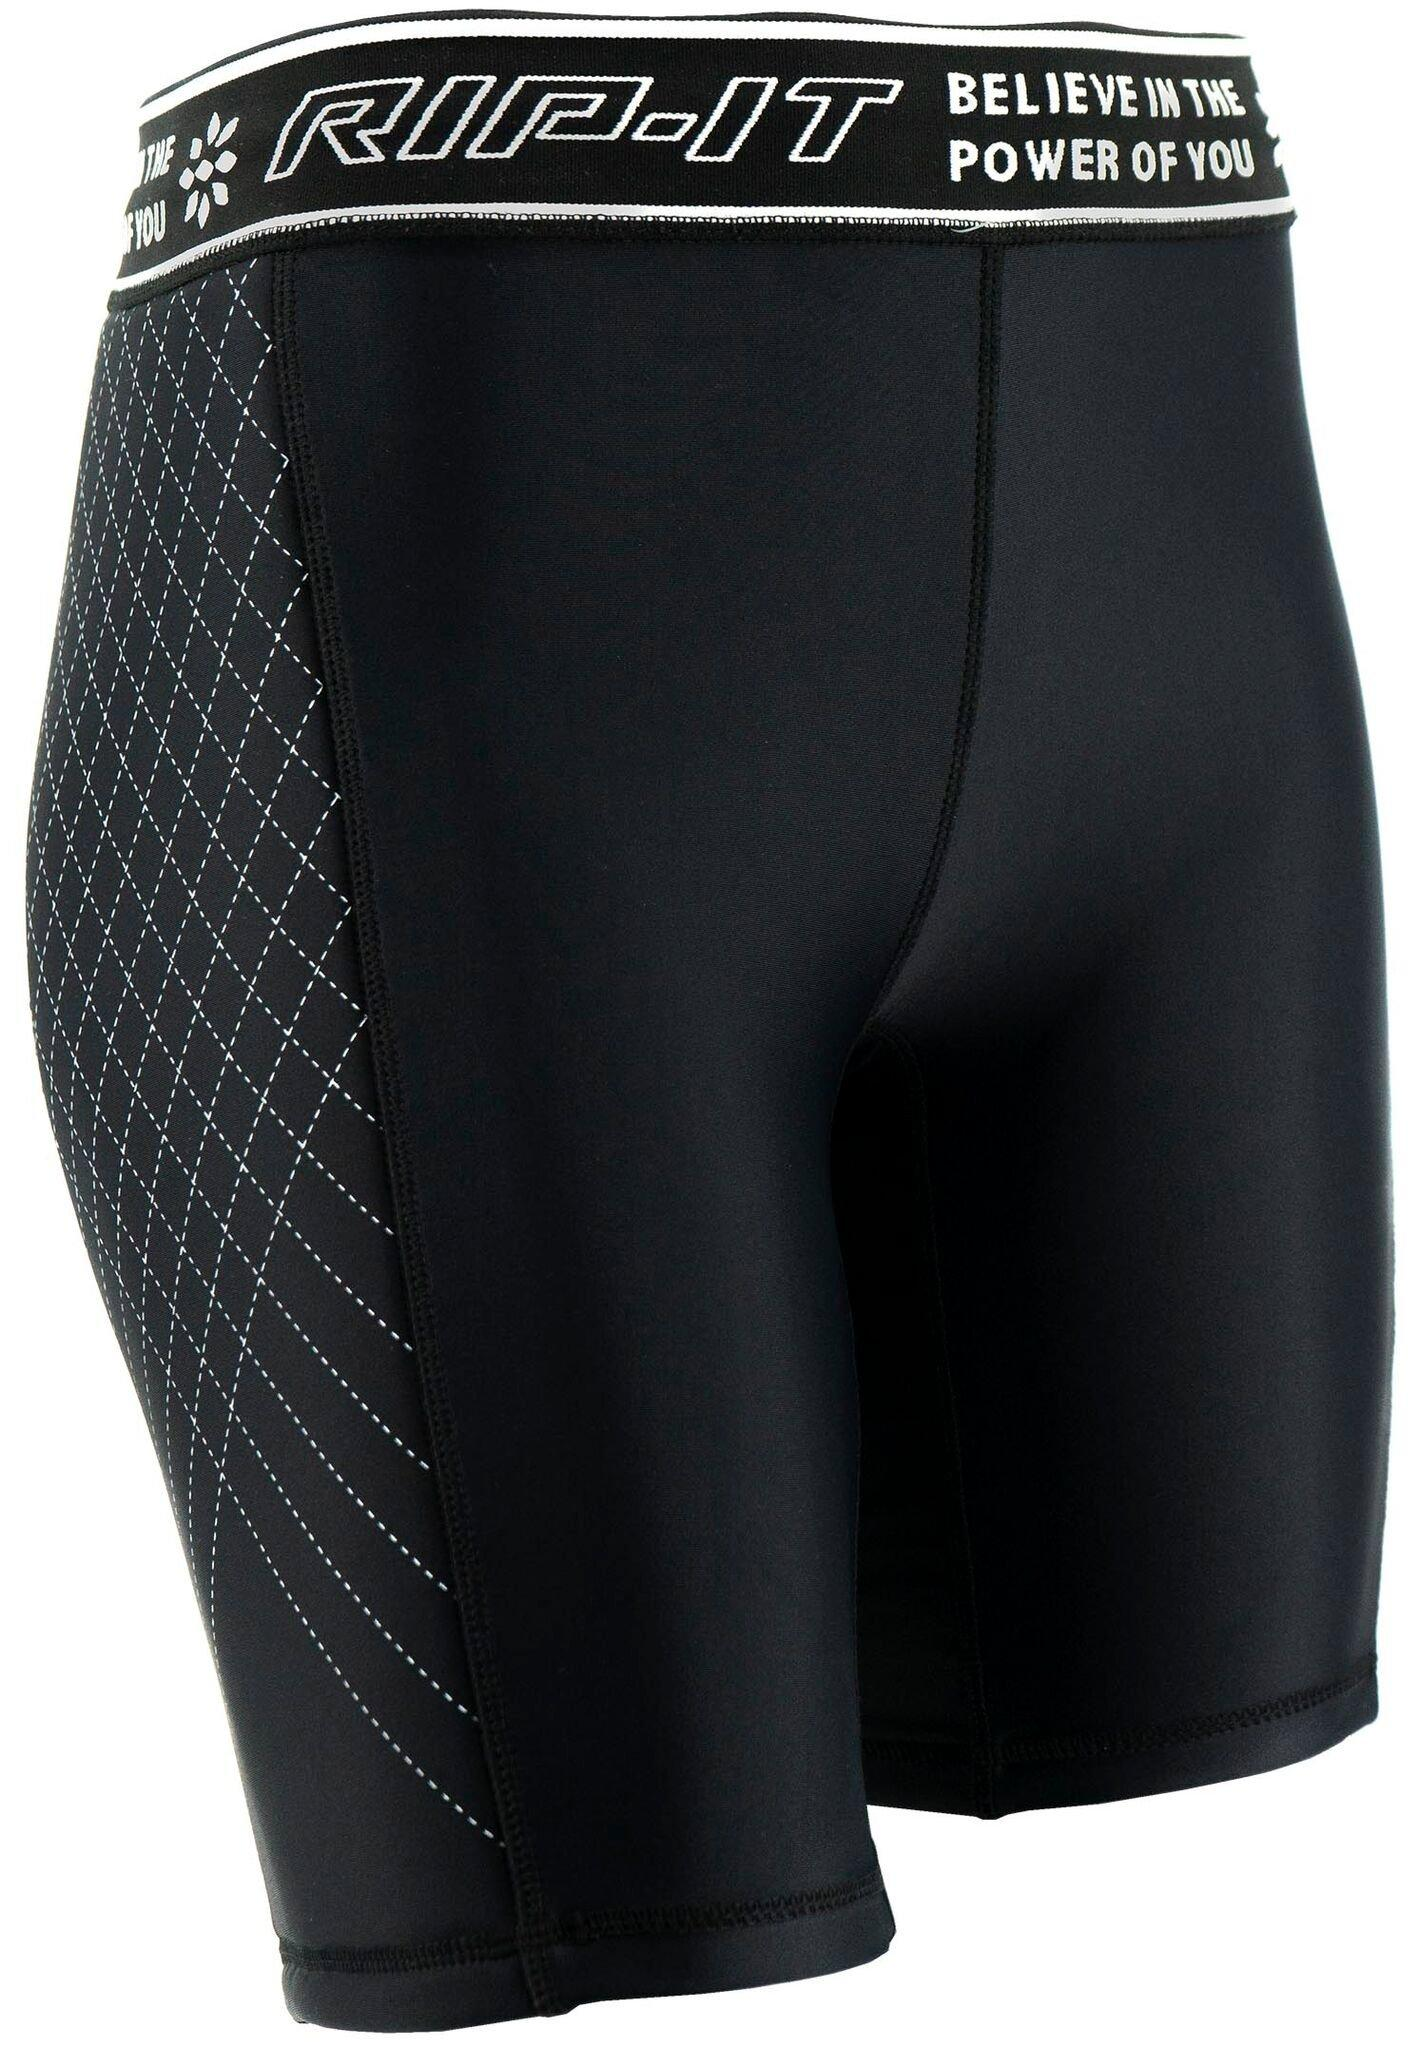 White, Medium RIP-IT Girls Period-Protection Softball Sliding Shorts